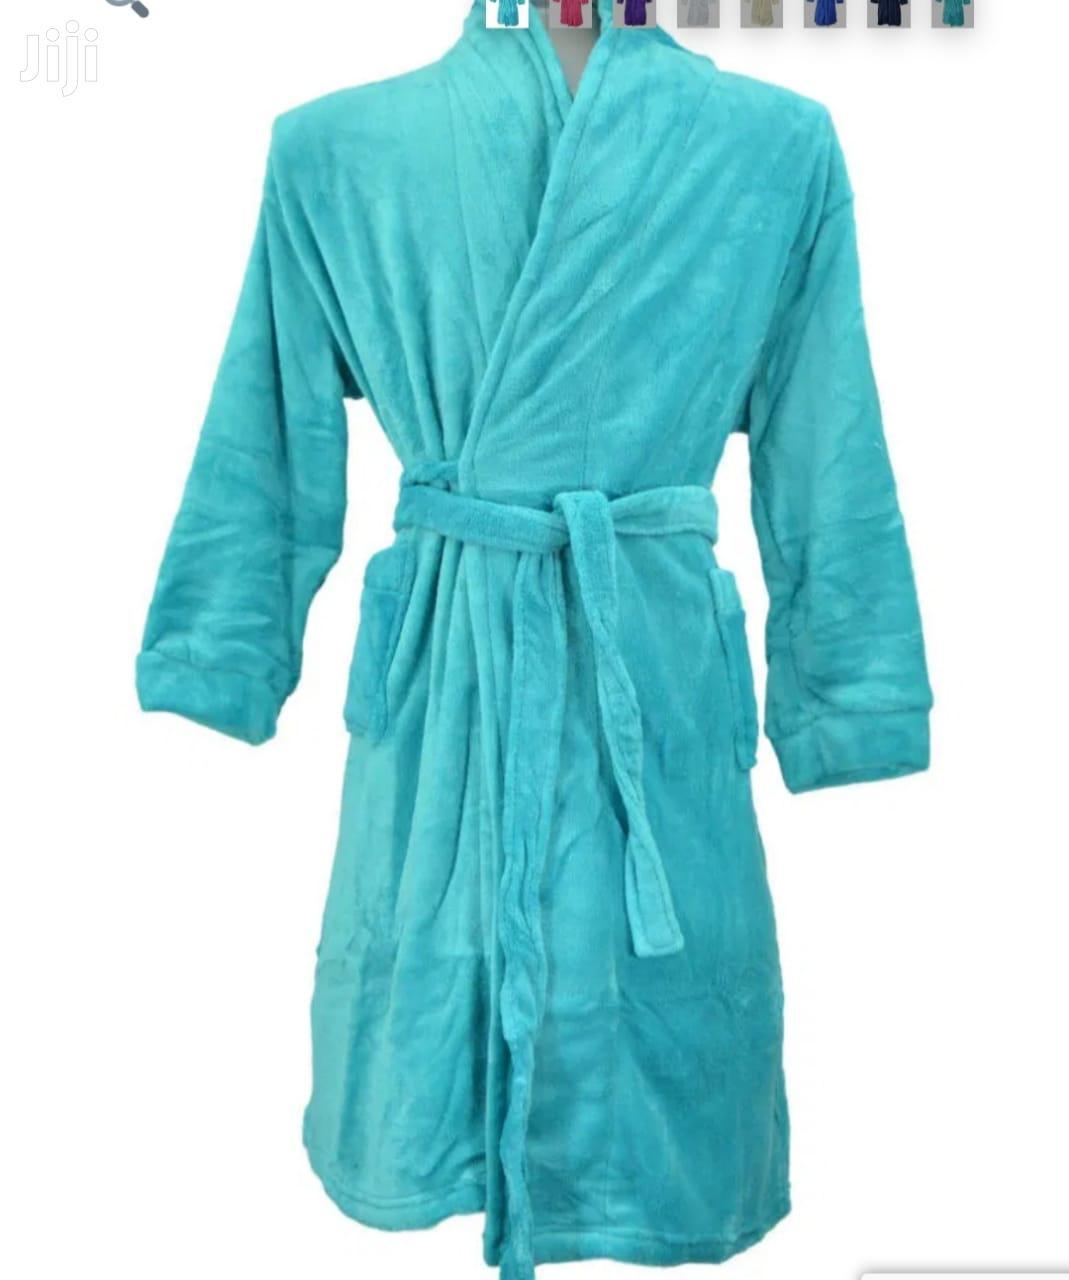 Bathrobe Available | Clothing for sale in Nairobi Central, Nairobi, Kenya